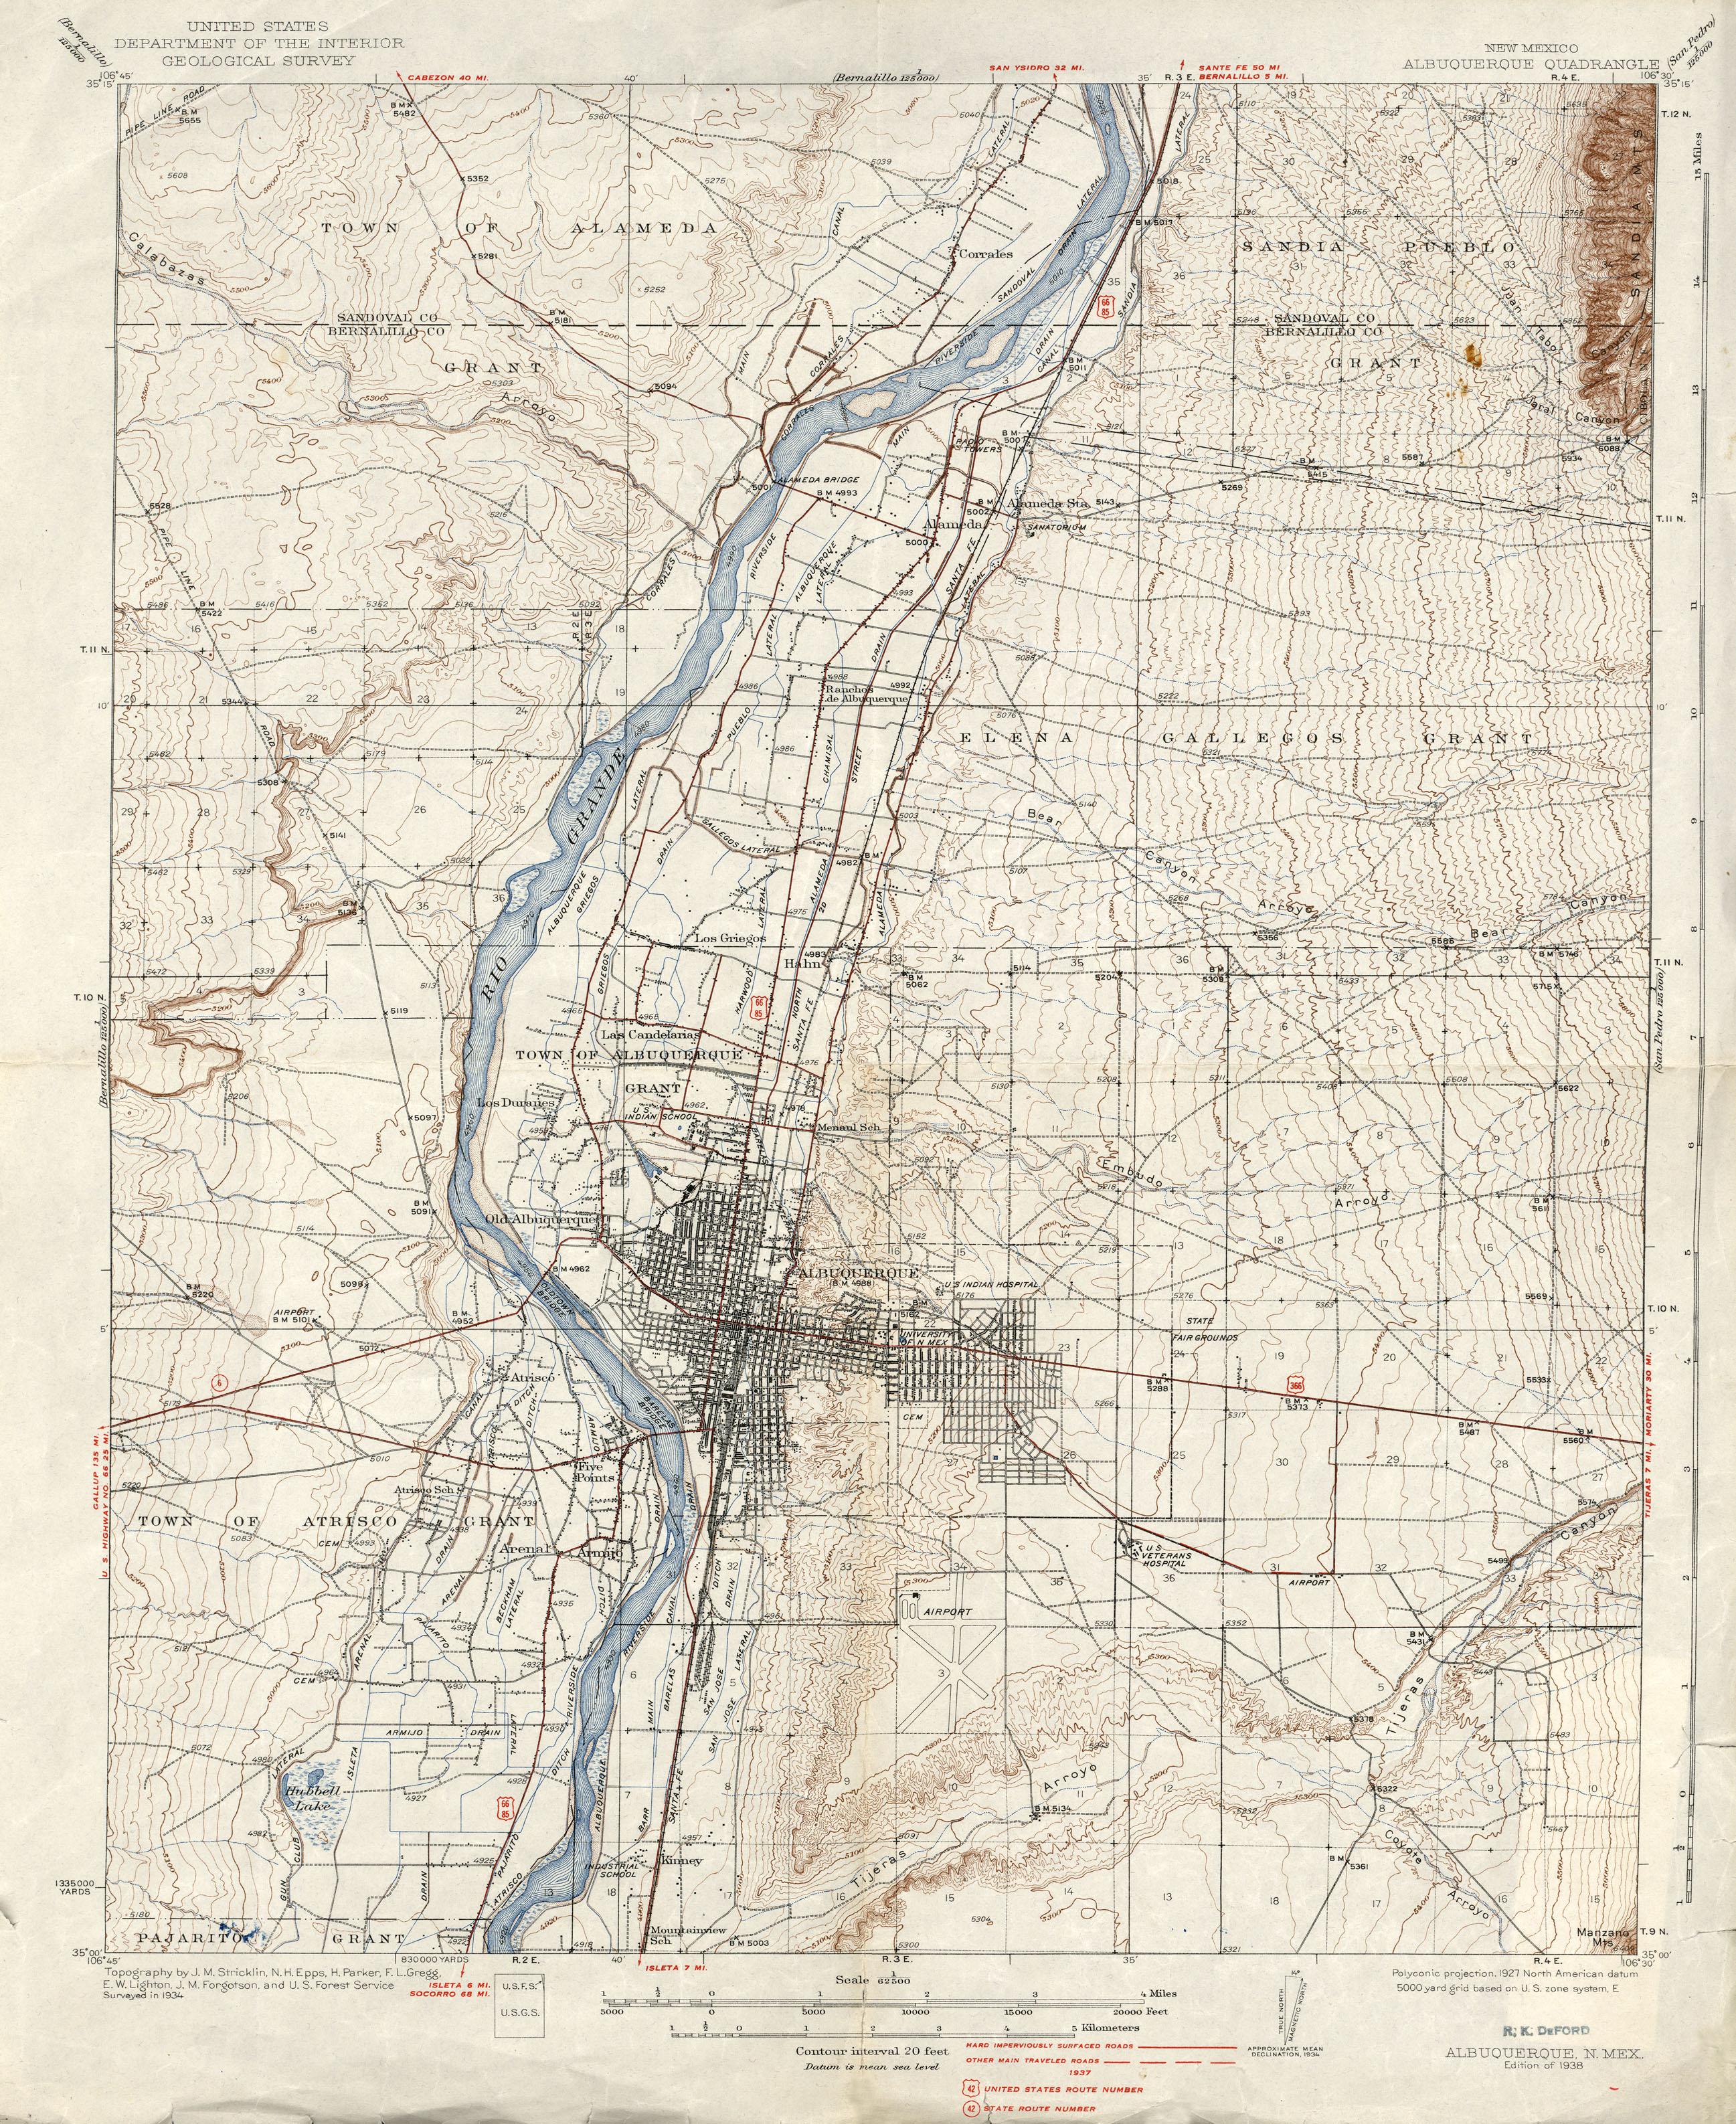 New Mexico Historical Topographic Maps - Perry-Castañeda Map - Printable Map Of Albuquerque